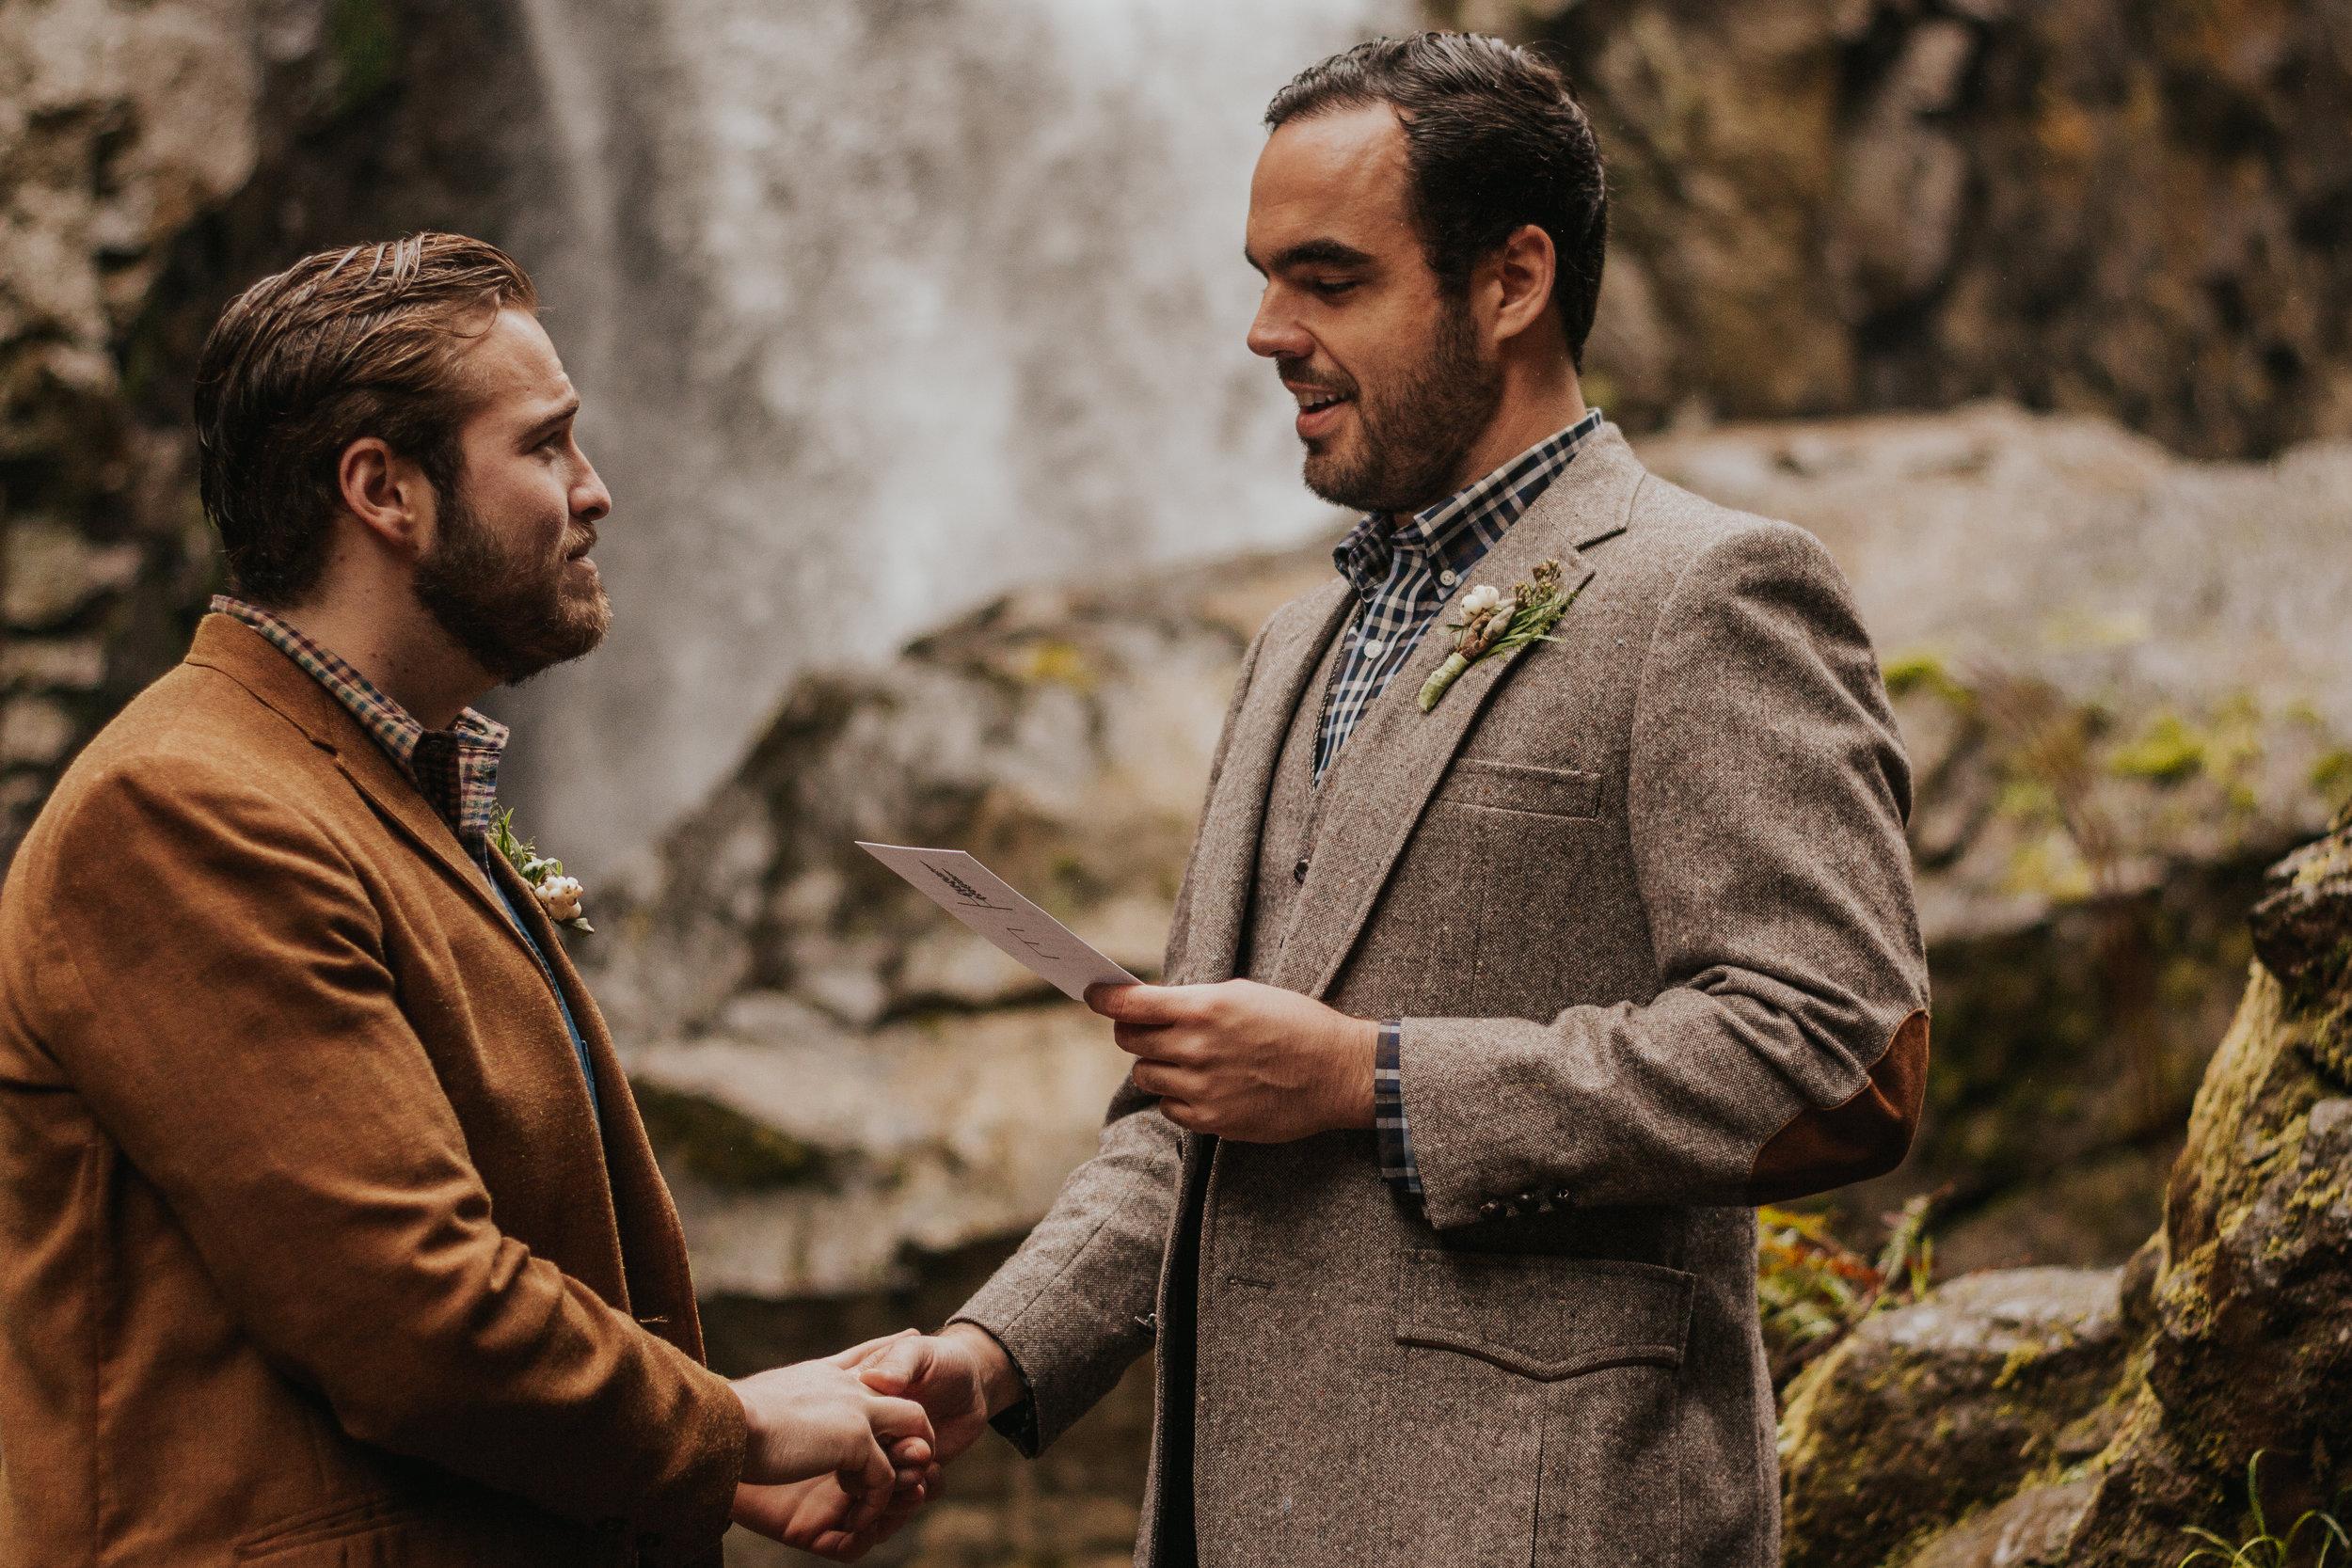 Oregon Forest Elopement Same Sex Reading Vows